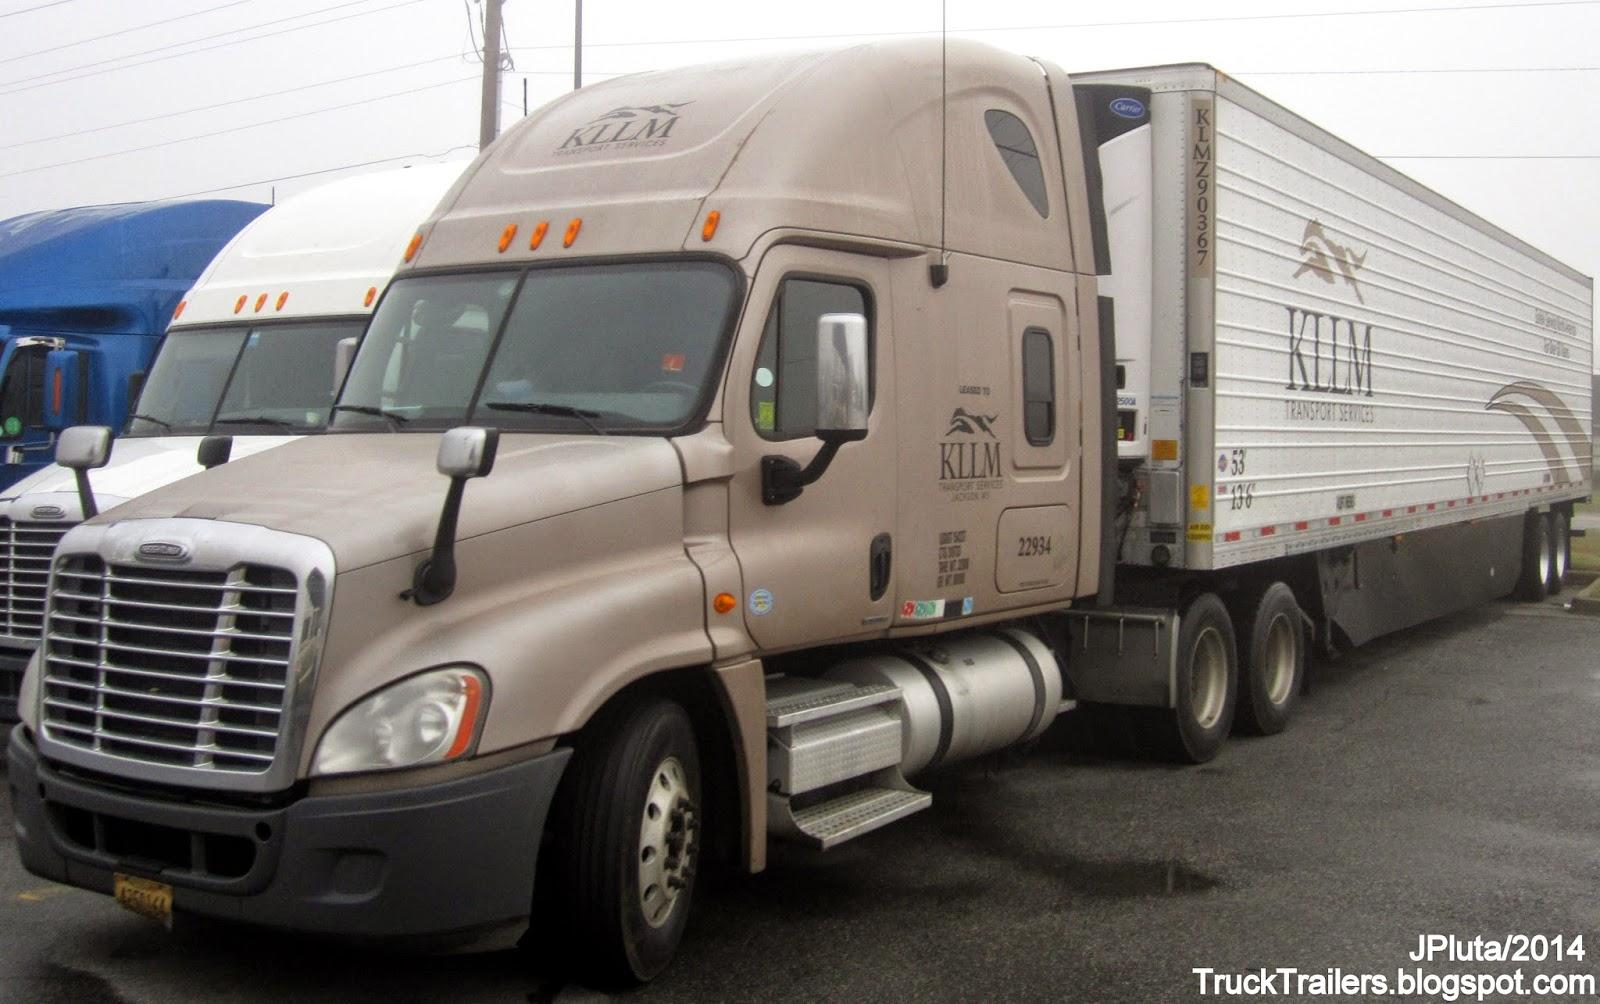 Kllm transport services jackson mississippi freightliner sleeper cab truck 22934 refrigerated 53 trailer kllm trucking company ms